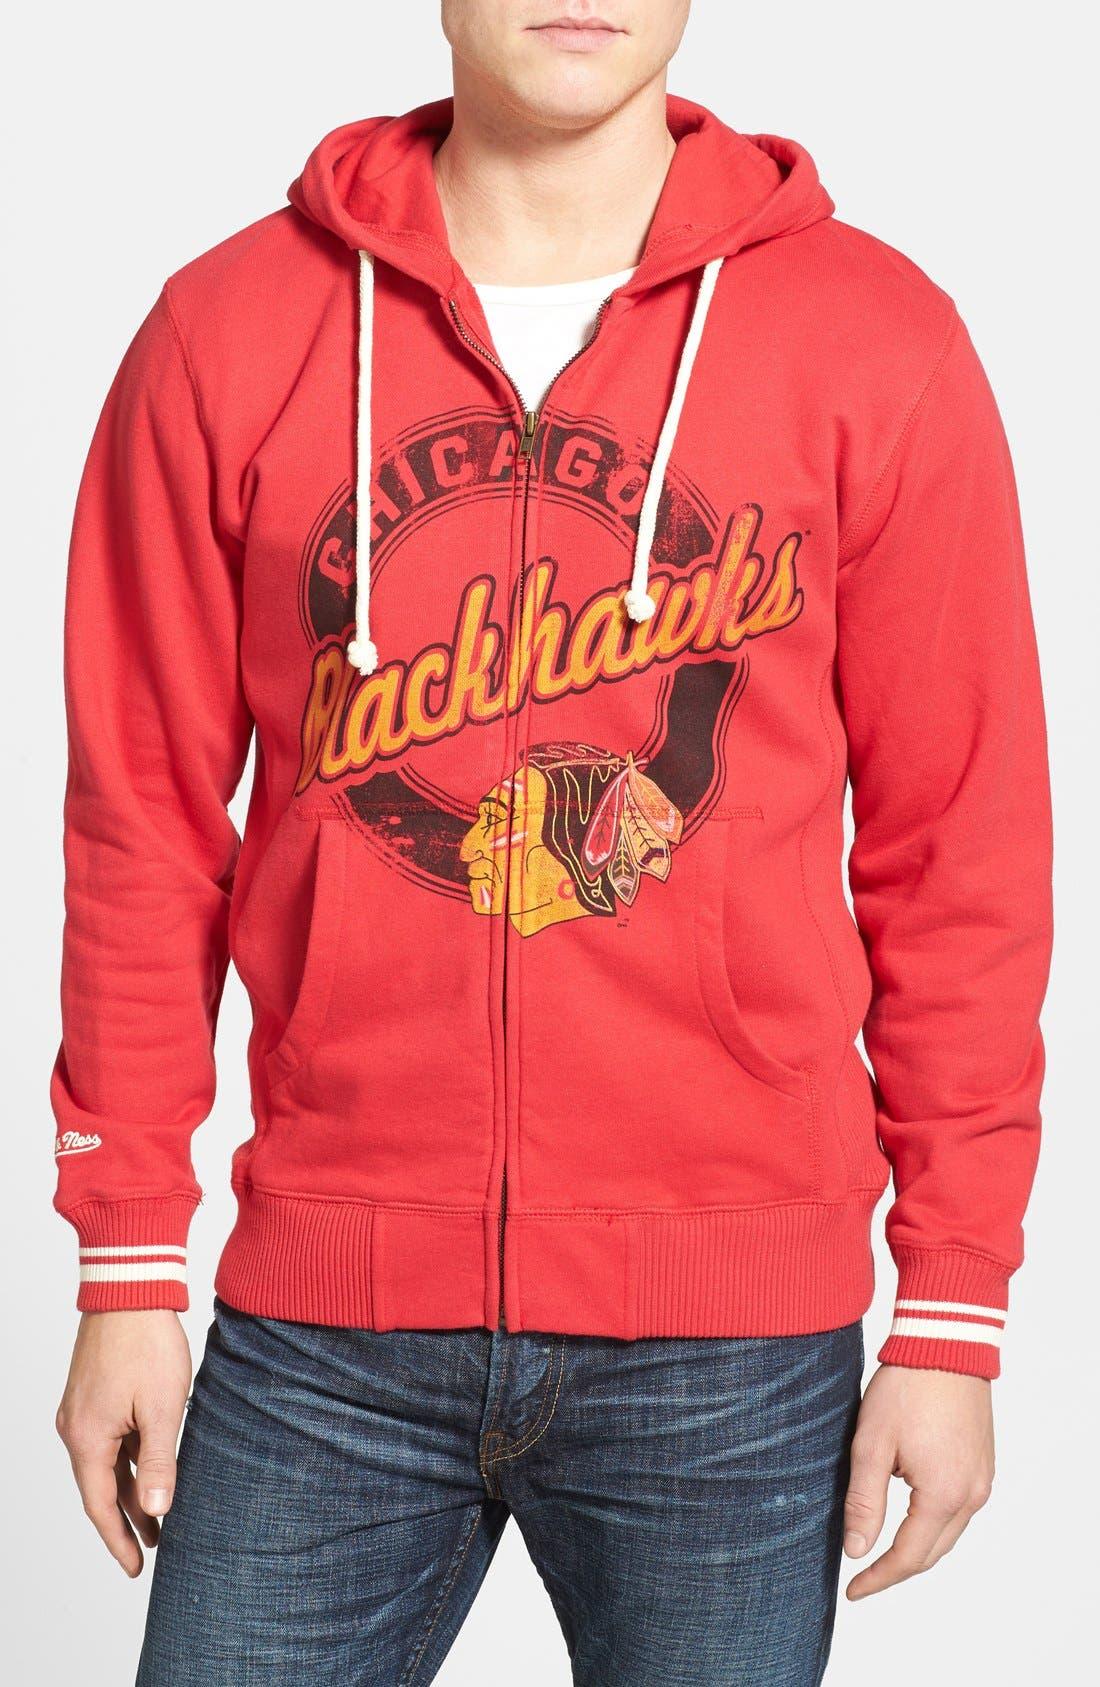 Alternate Image 1 Selected - Mitchell & Ness 'Chicago Blackhawks' Full Zip Hoodie